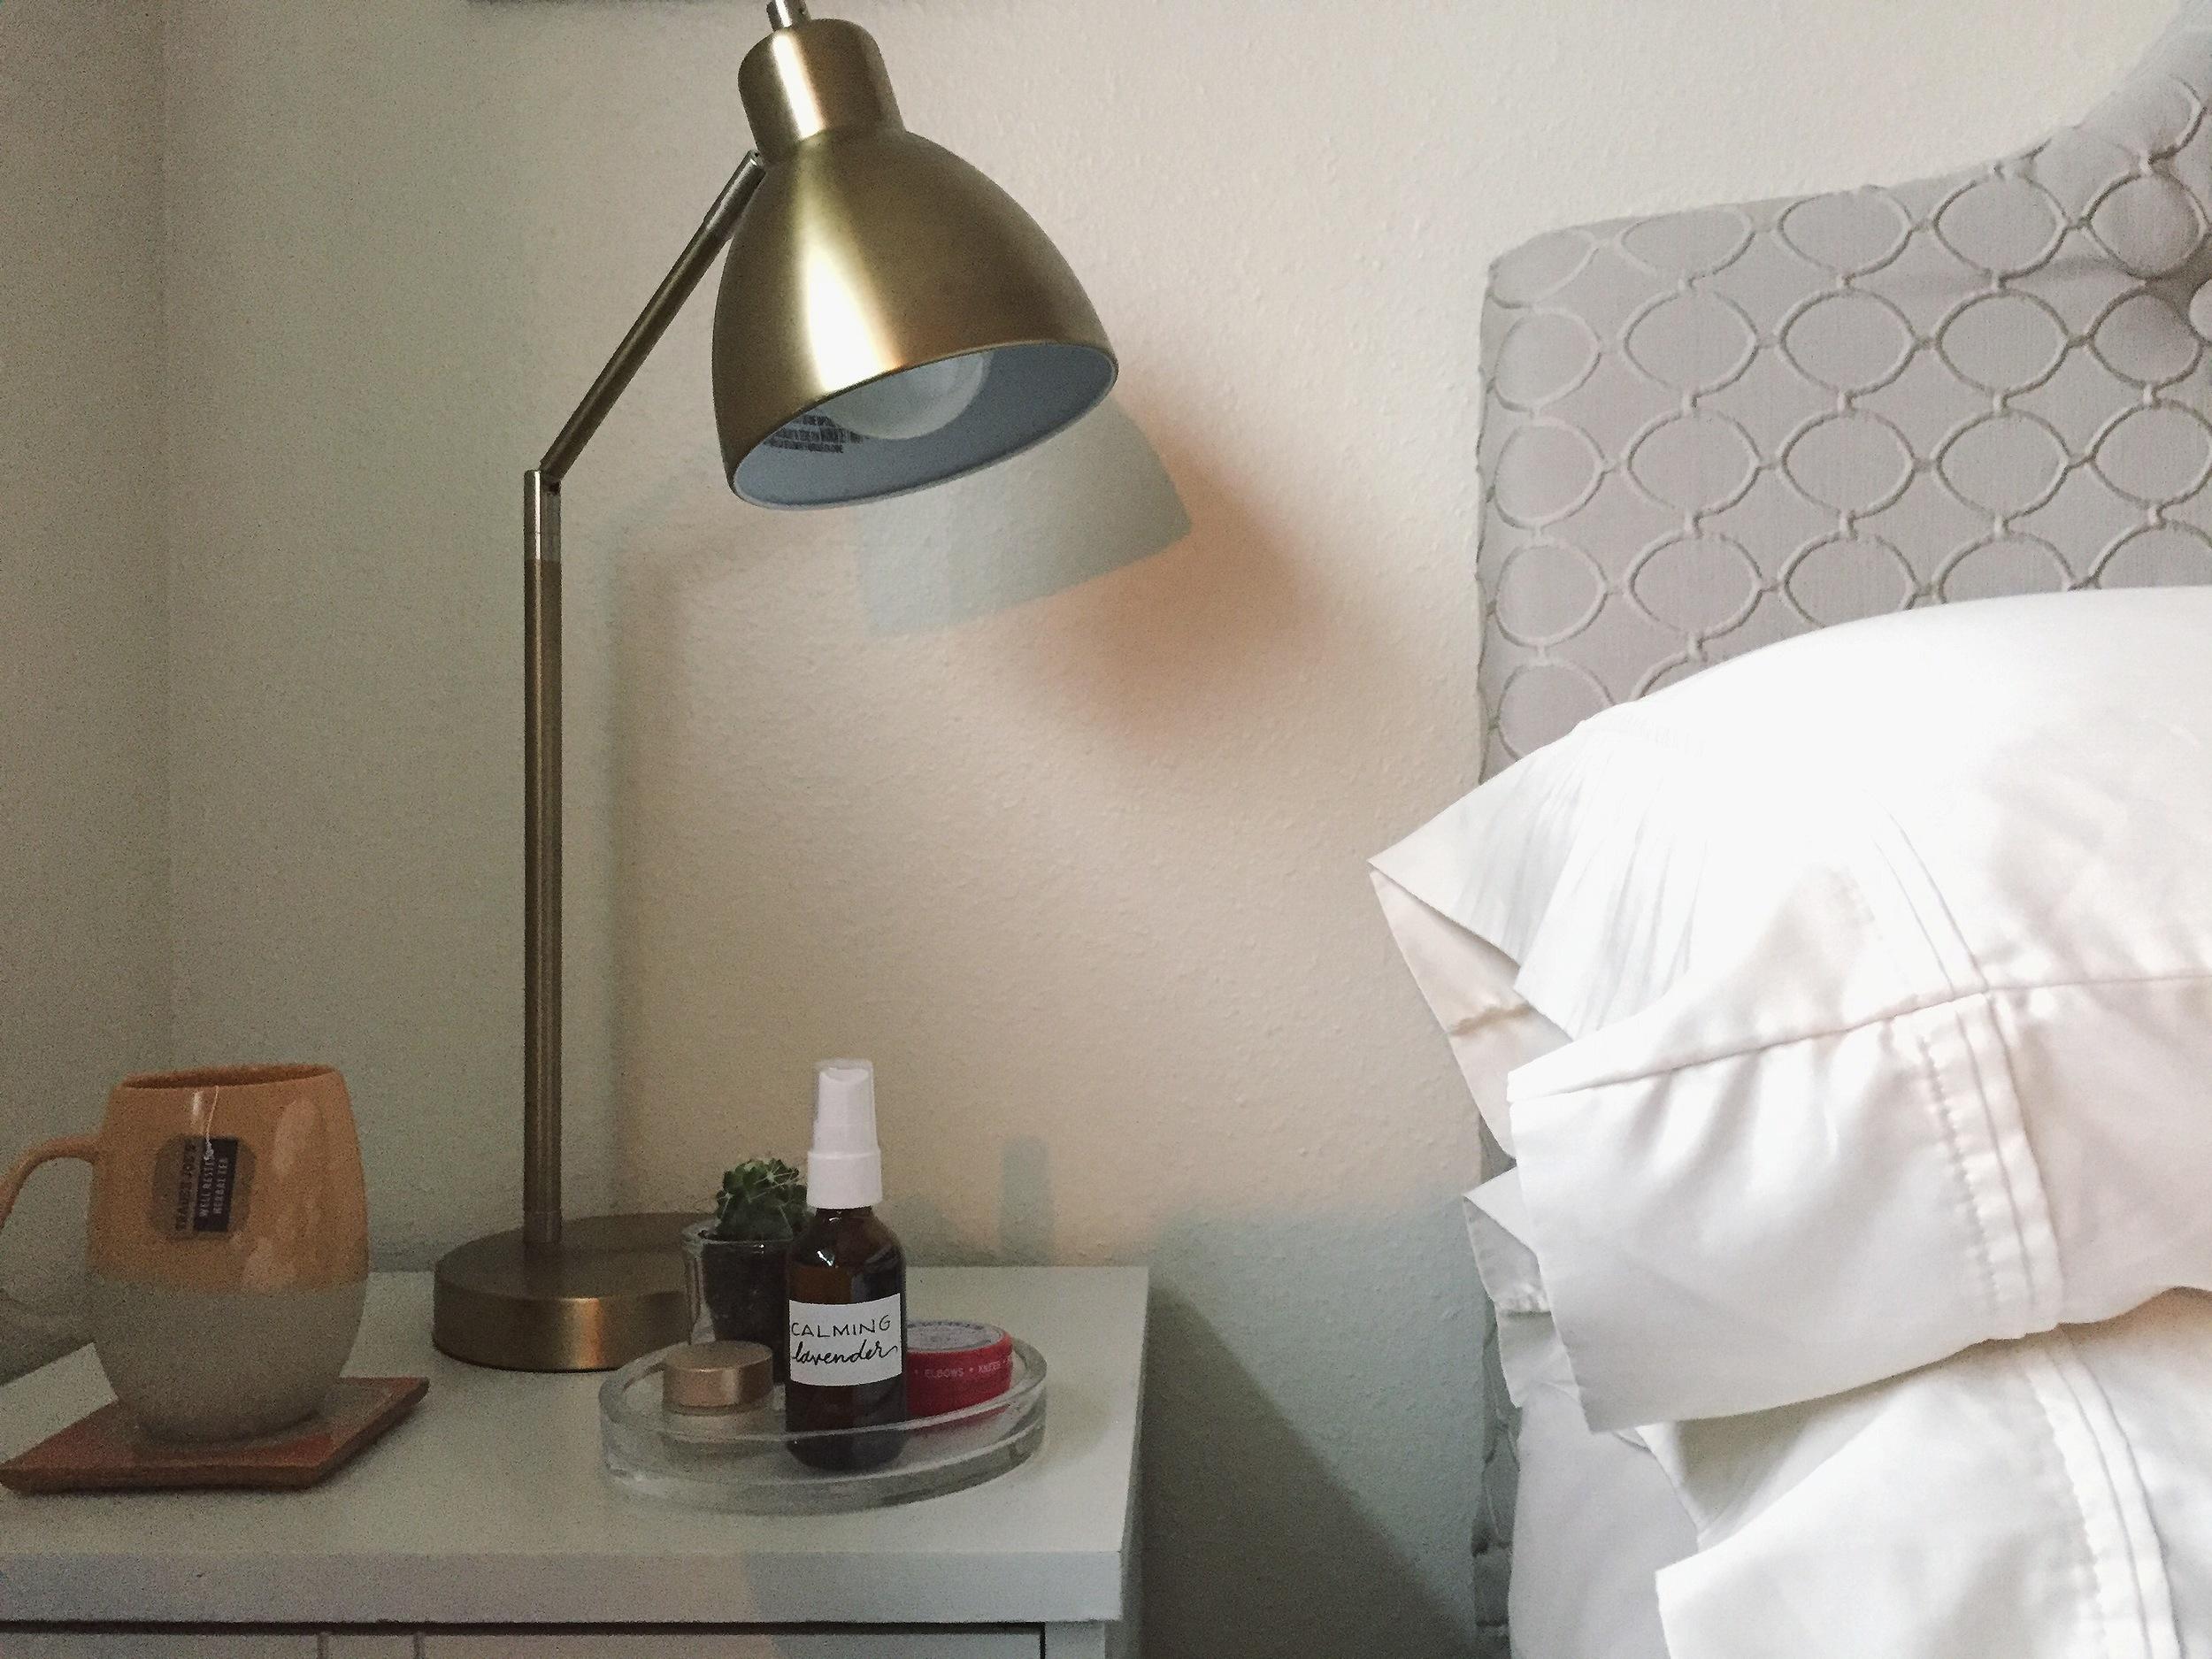 DIY Fragrance Mist with Essential Oils | All Purpose Flour Child